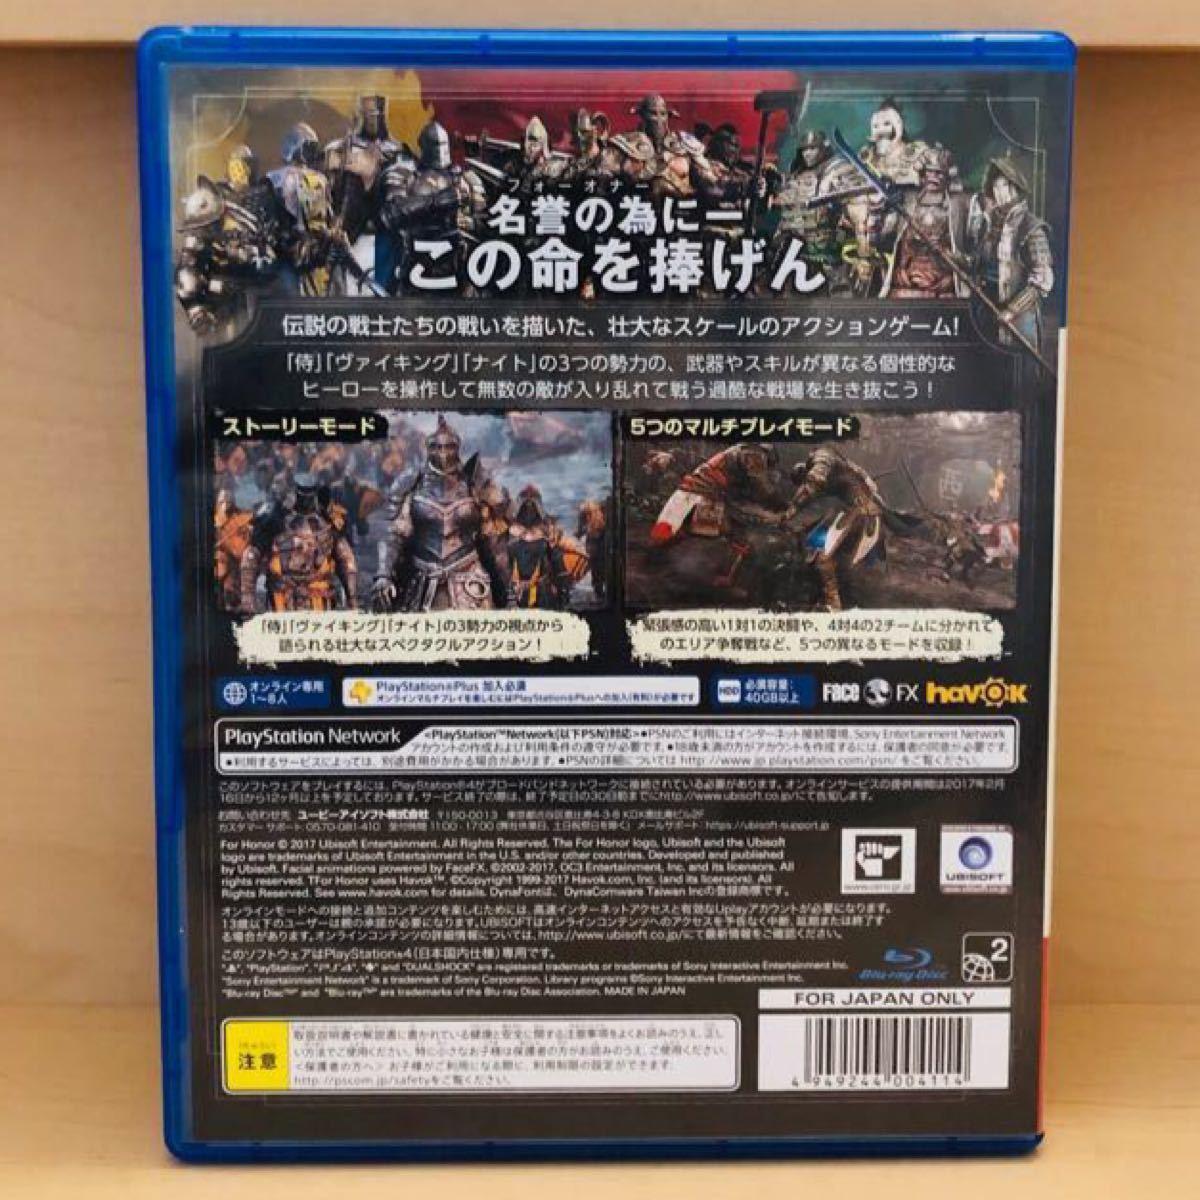 PS4 プレイステーション4  ソフト ゲーム パッケージ フォーオナー PlayStation  お家時間 夏休み 趣味